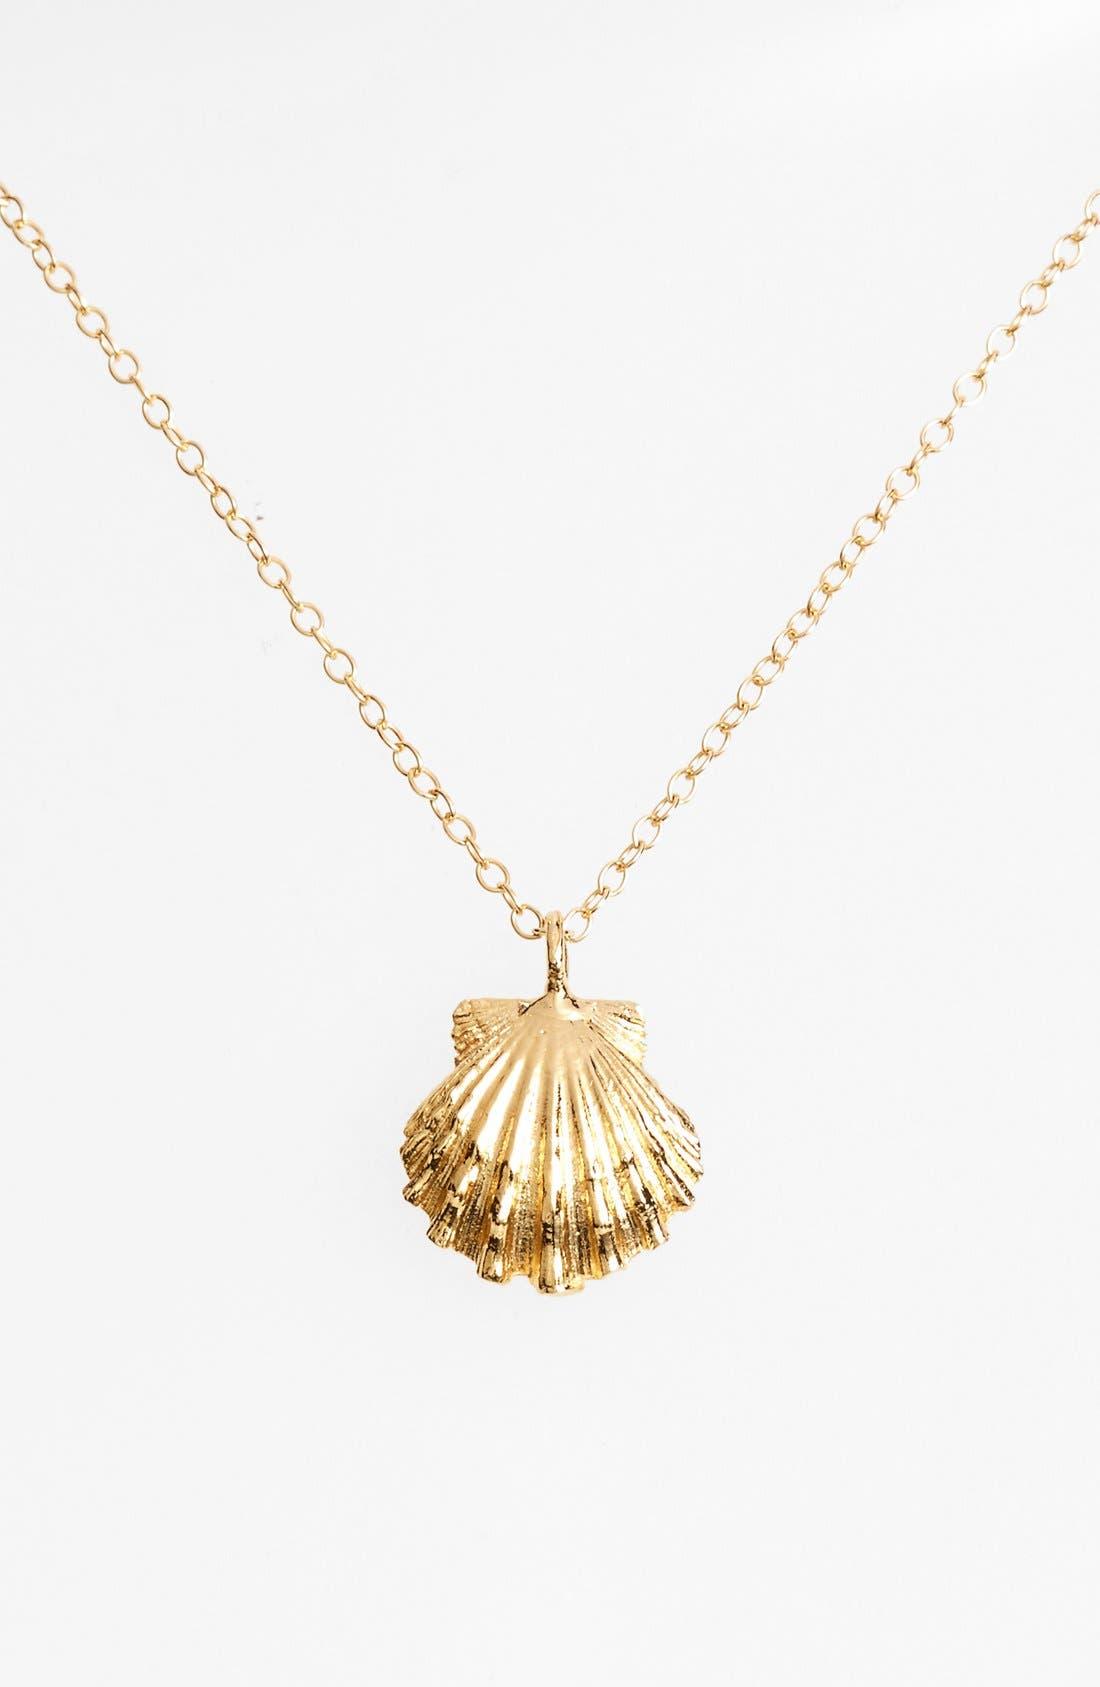 Alternate Image 1 Selected - ki-ele 'Golden Sunrise' Shell Pendant Necklace